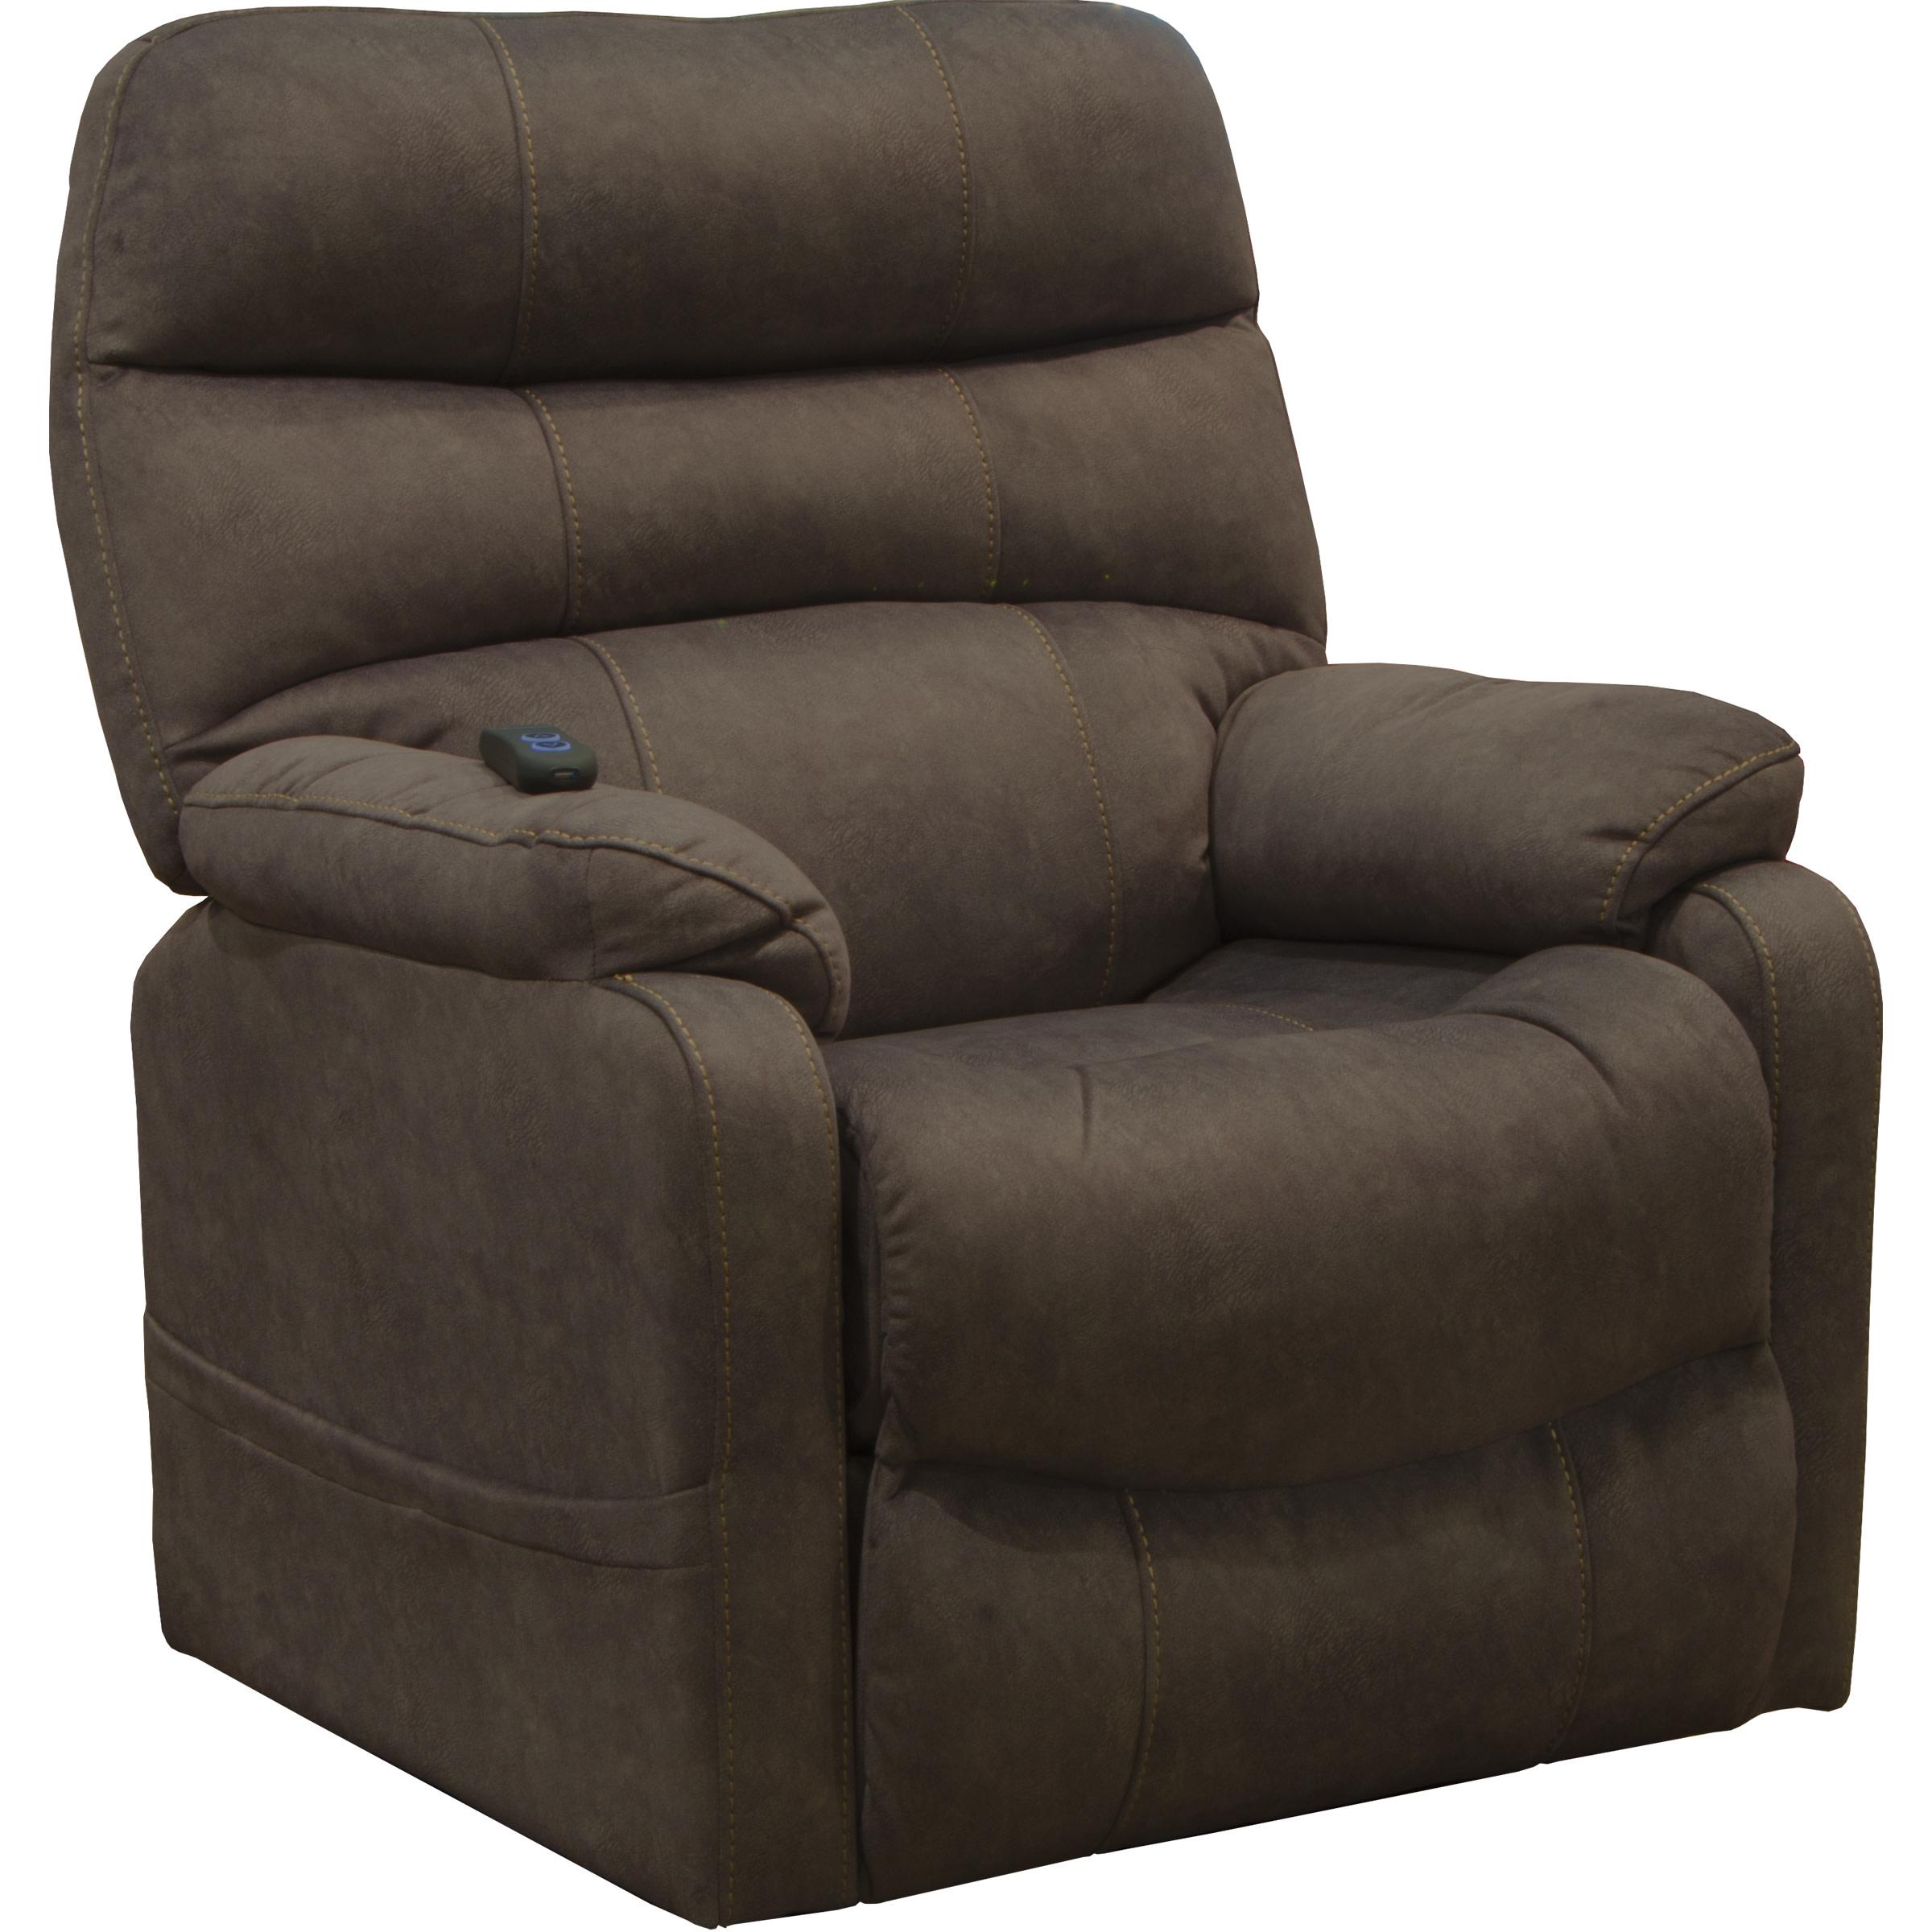 Buckley Lift Chair